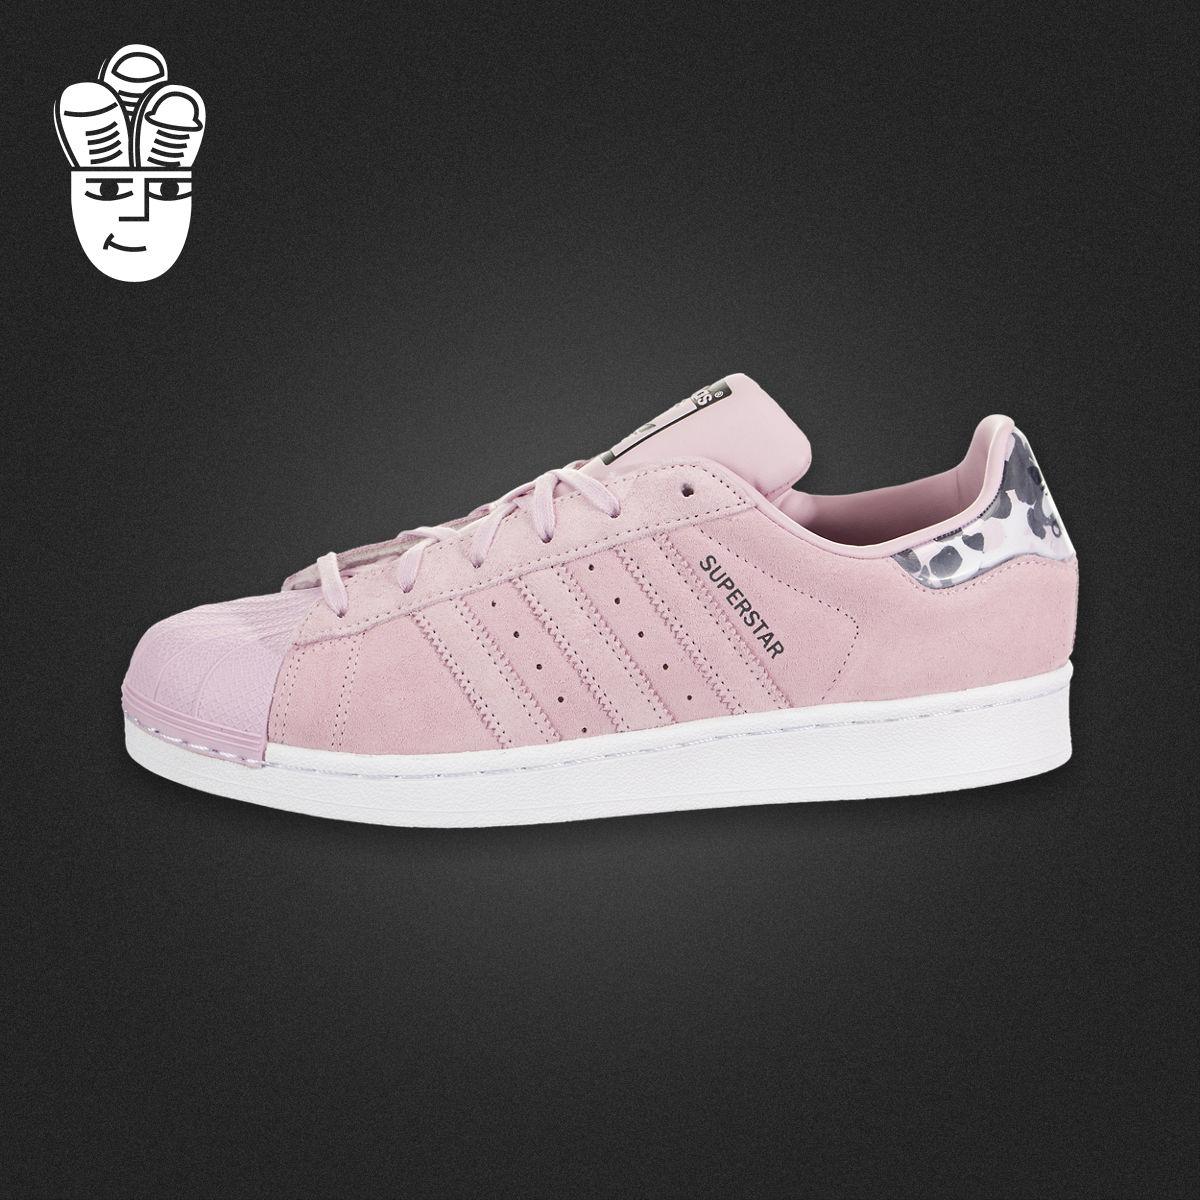 Adidas Superstar 阿迪达斯男鞋女鞋 三叶草贝壳头板鞋 休闲鞋